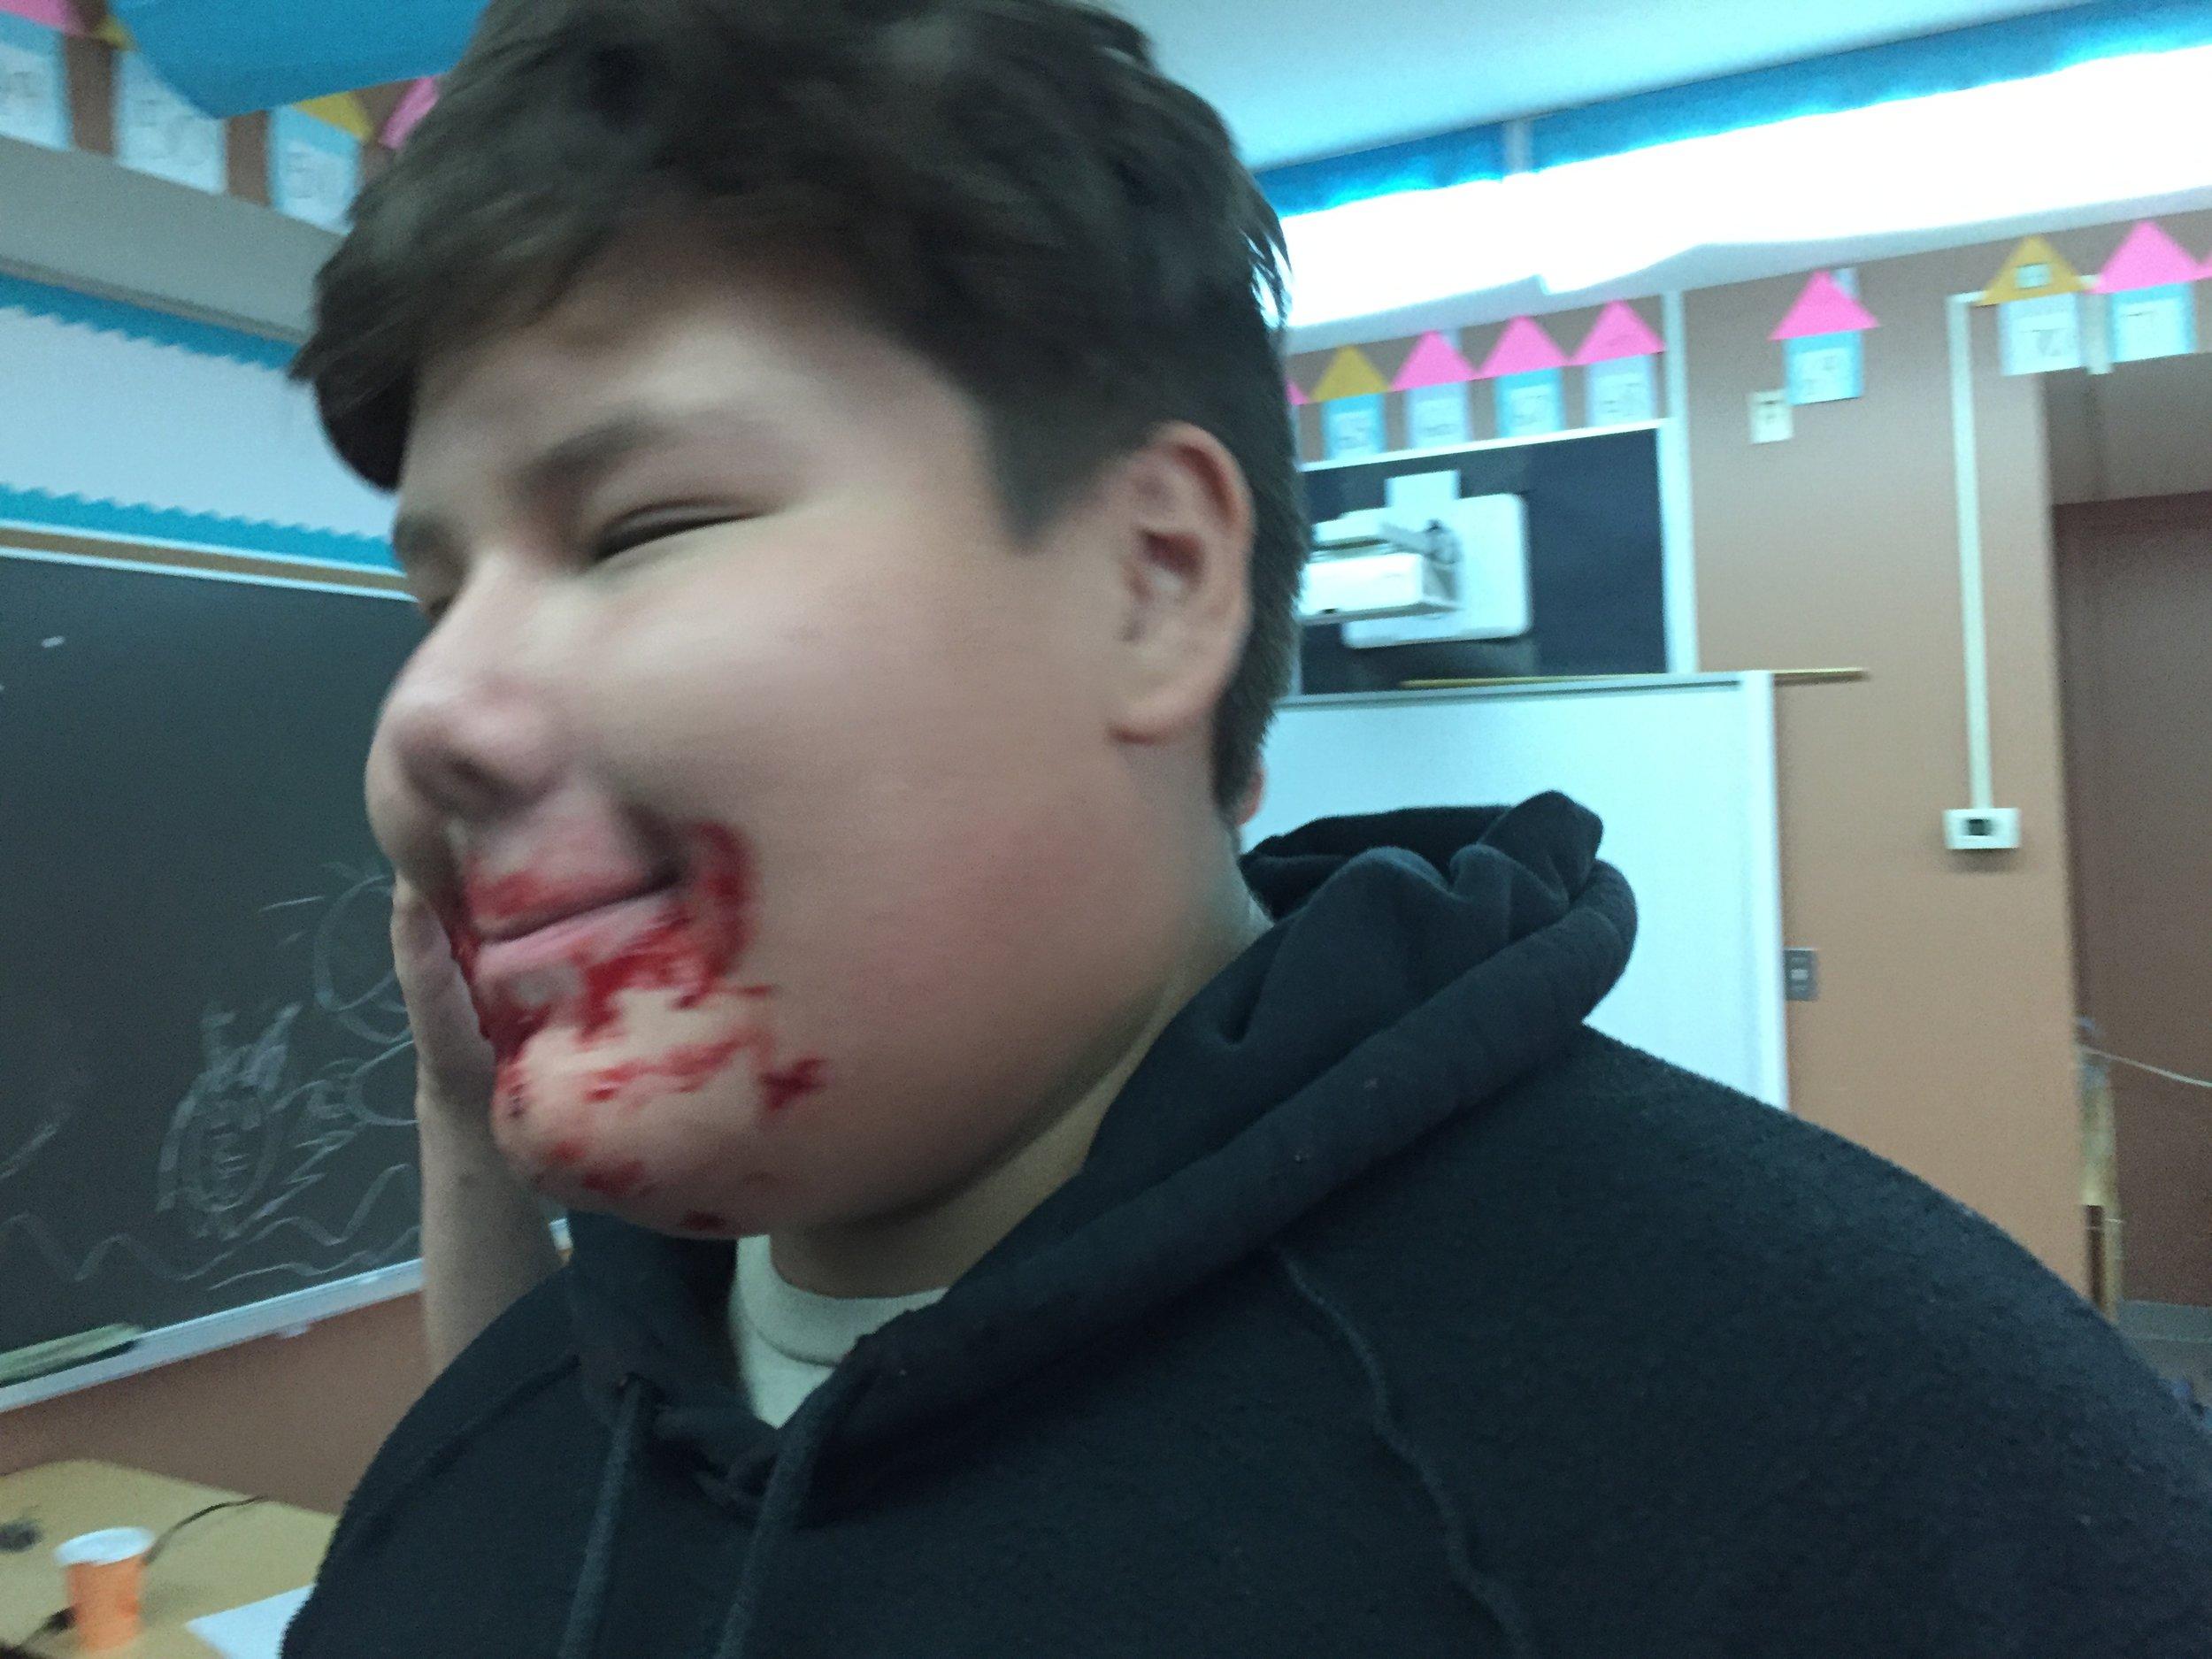 Flesh eating Zombie